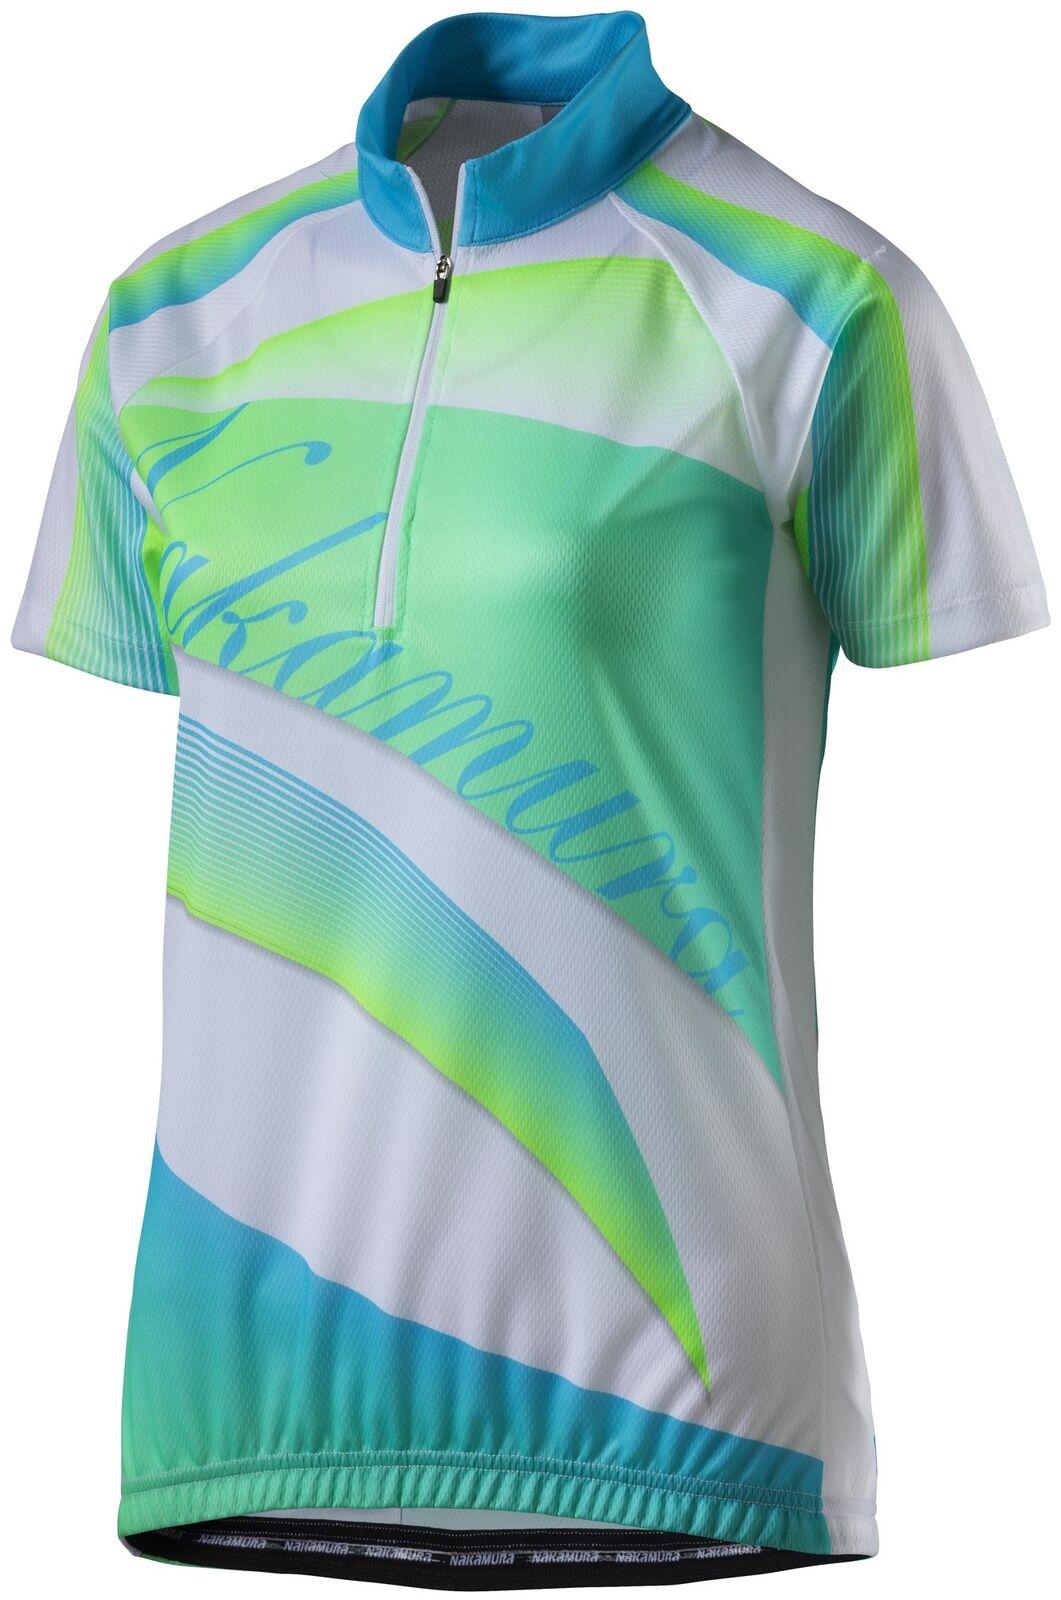 Nakamura Ladies Cycling Jersey EABHA fahrradtrikotradshirt T-Shirt Bike Shirt